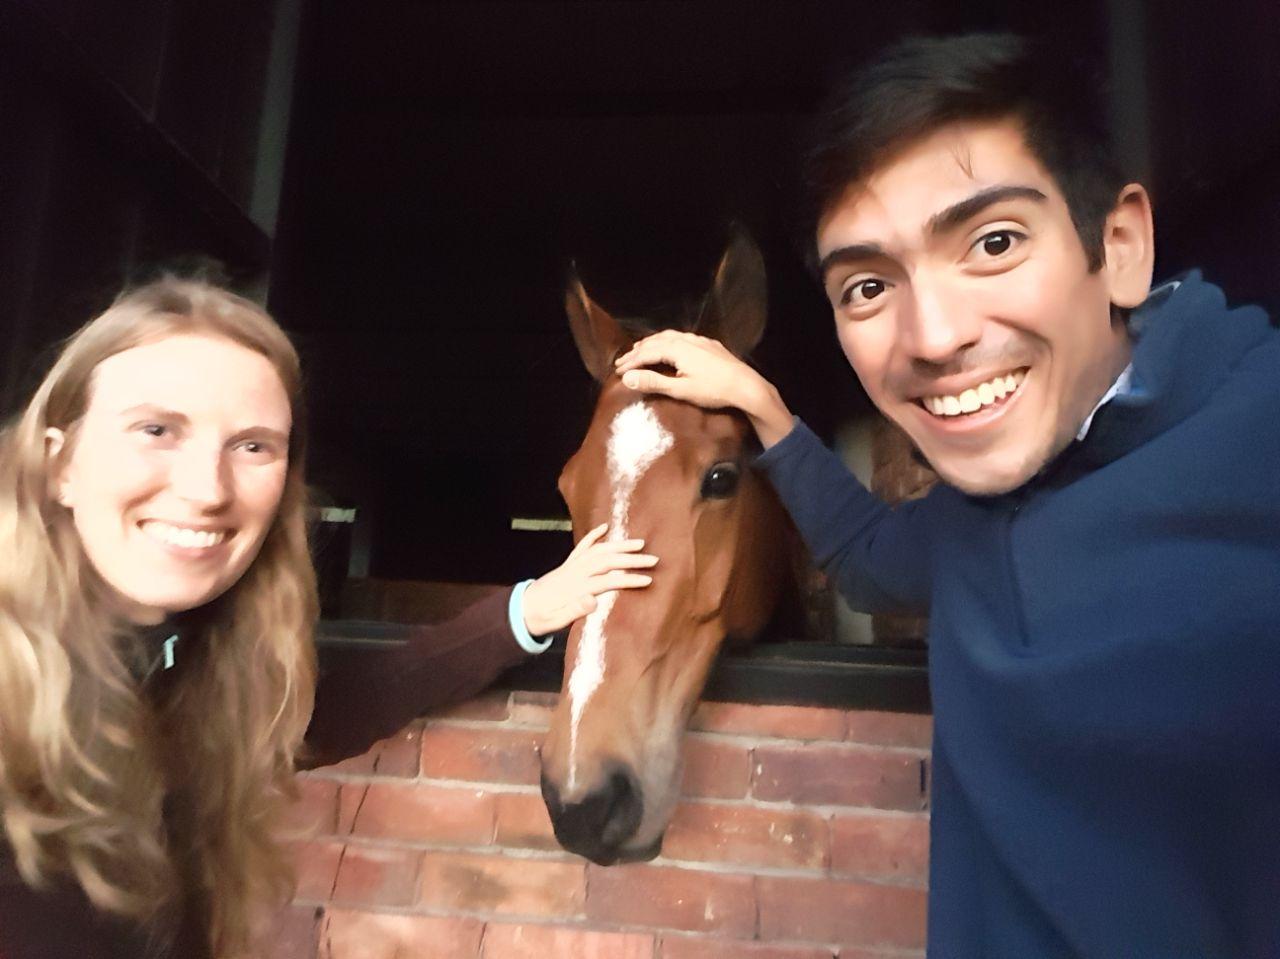 Dol op paarden